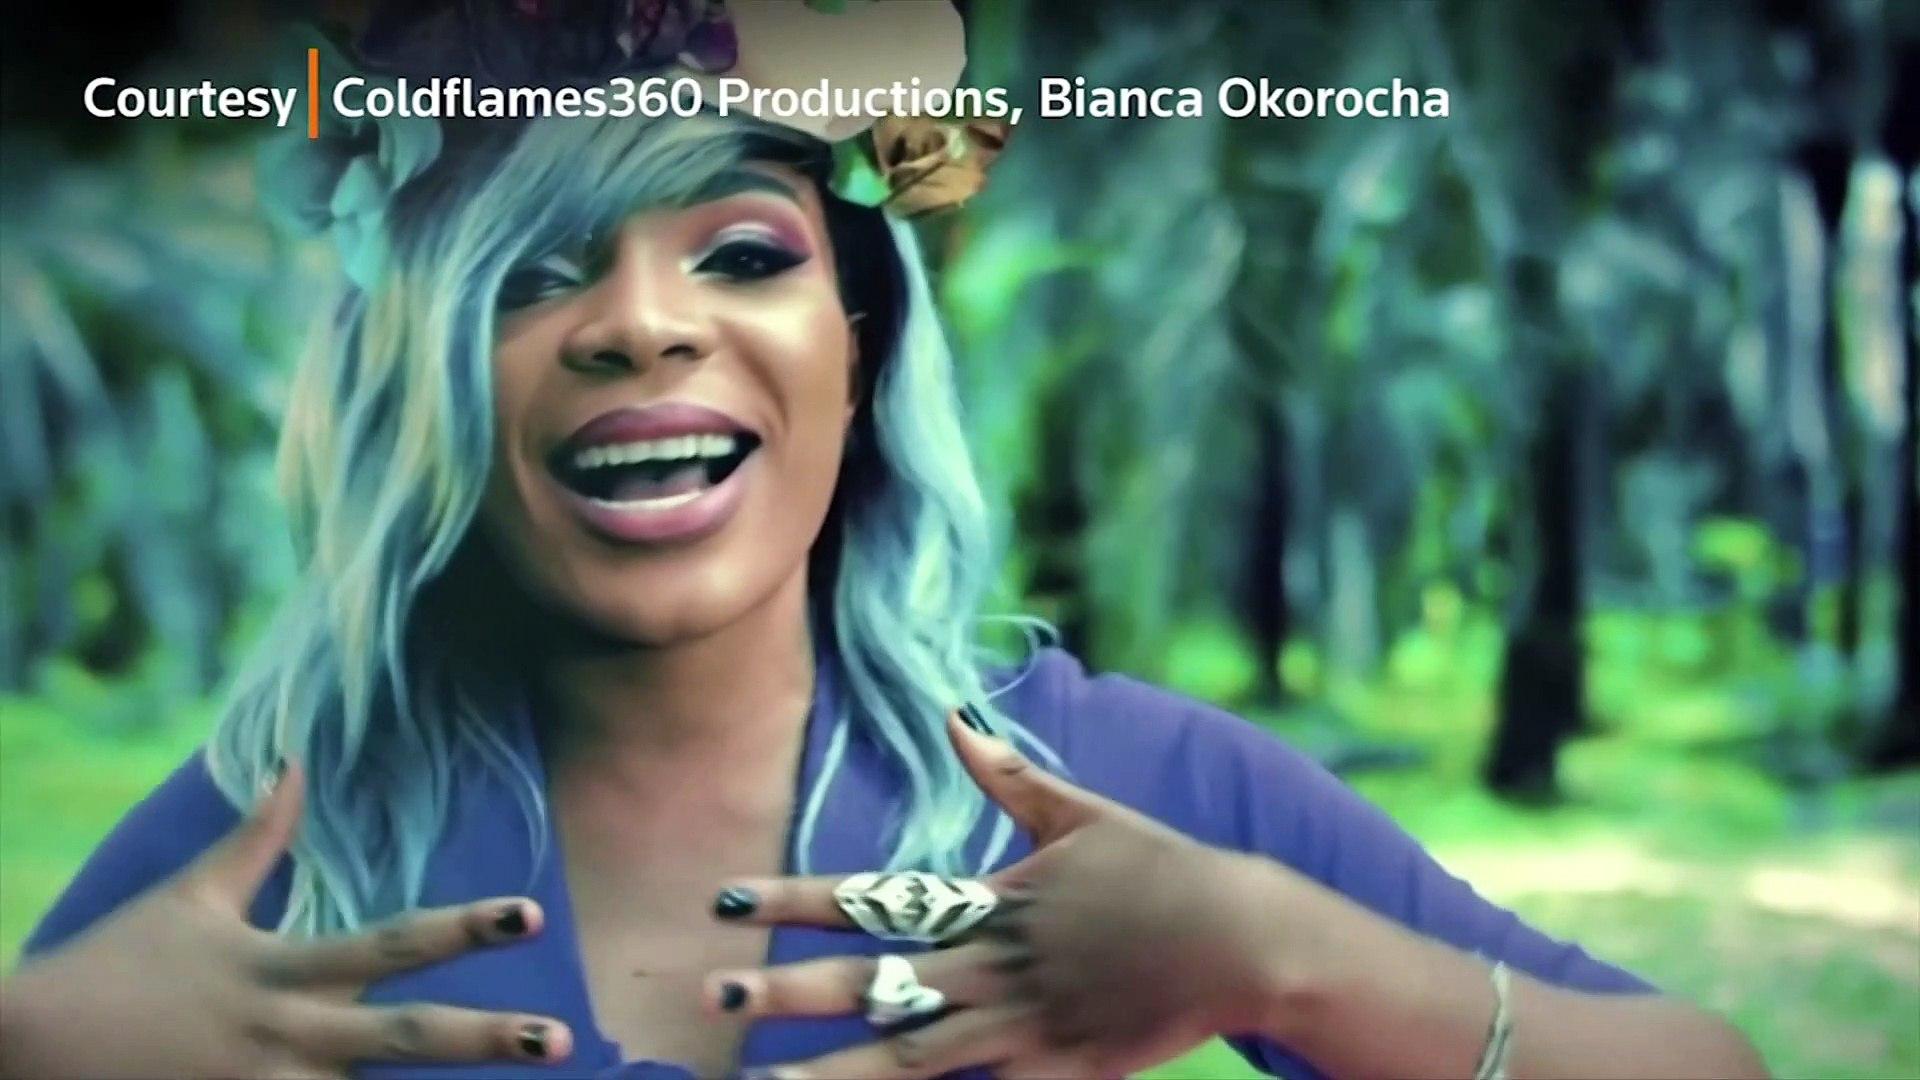 Musician 'Clay' brings rock to Nigerian music scene